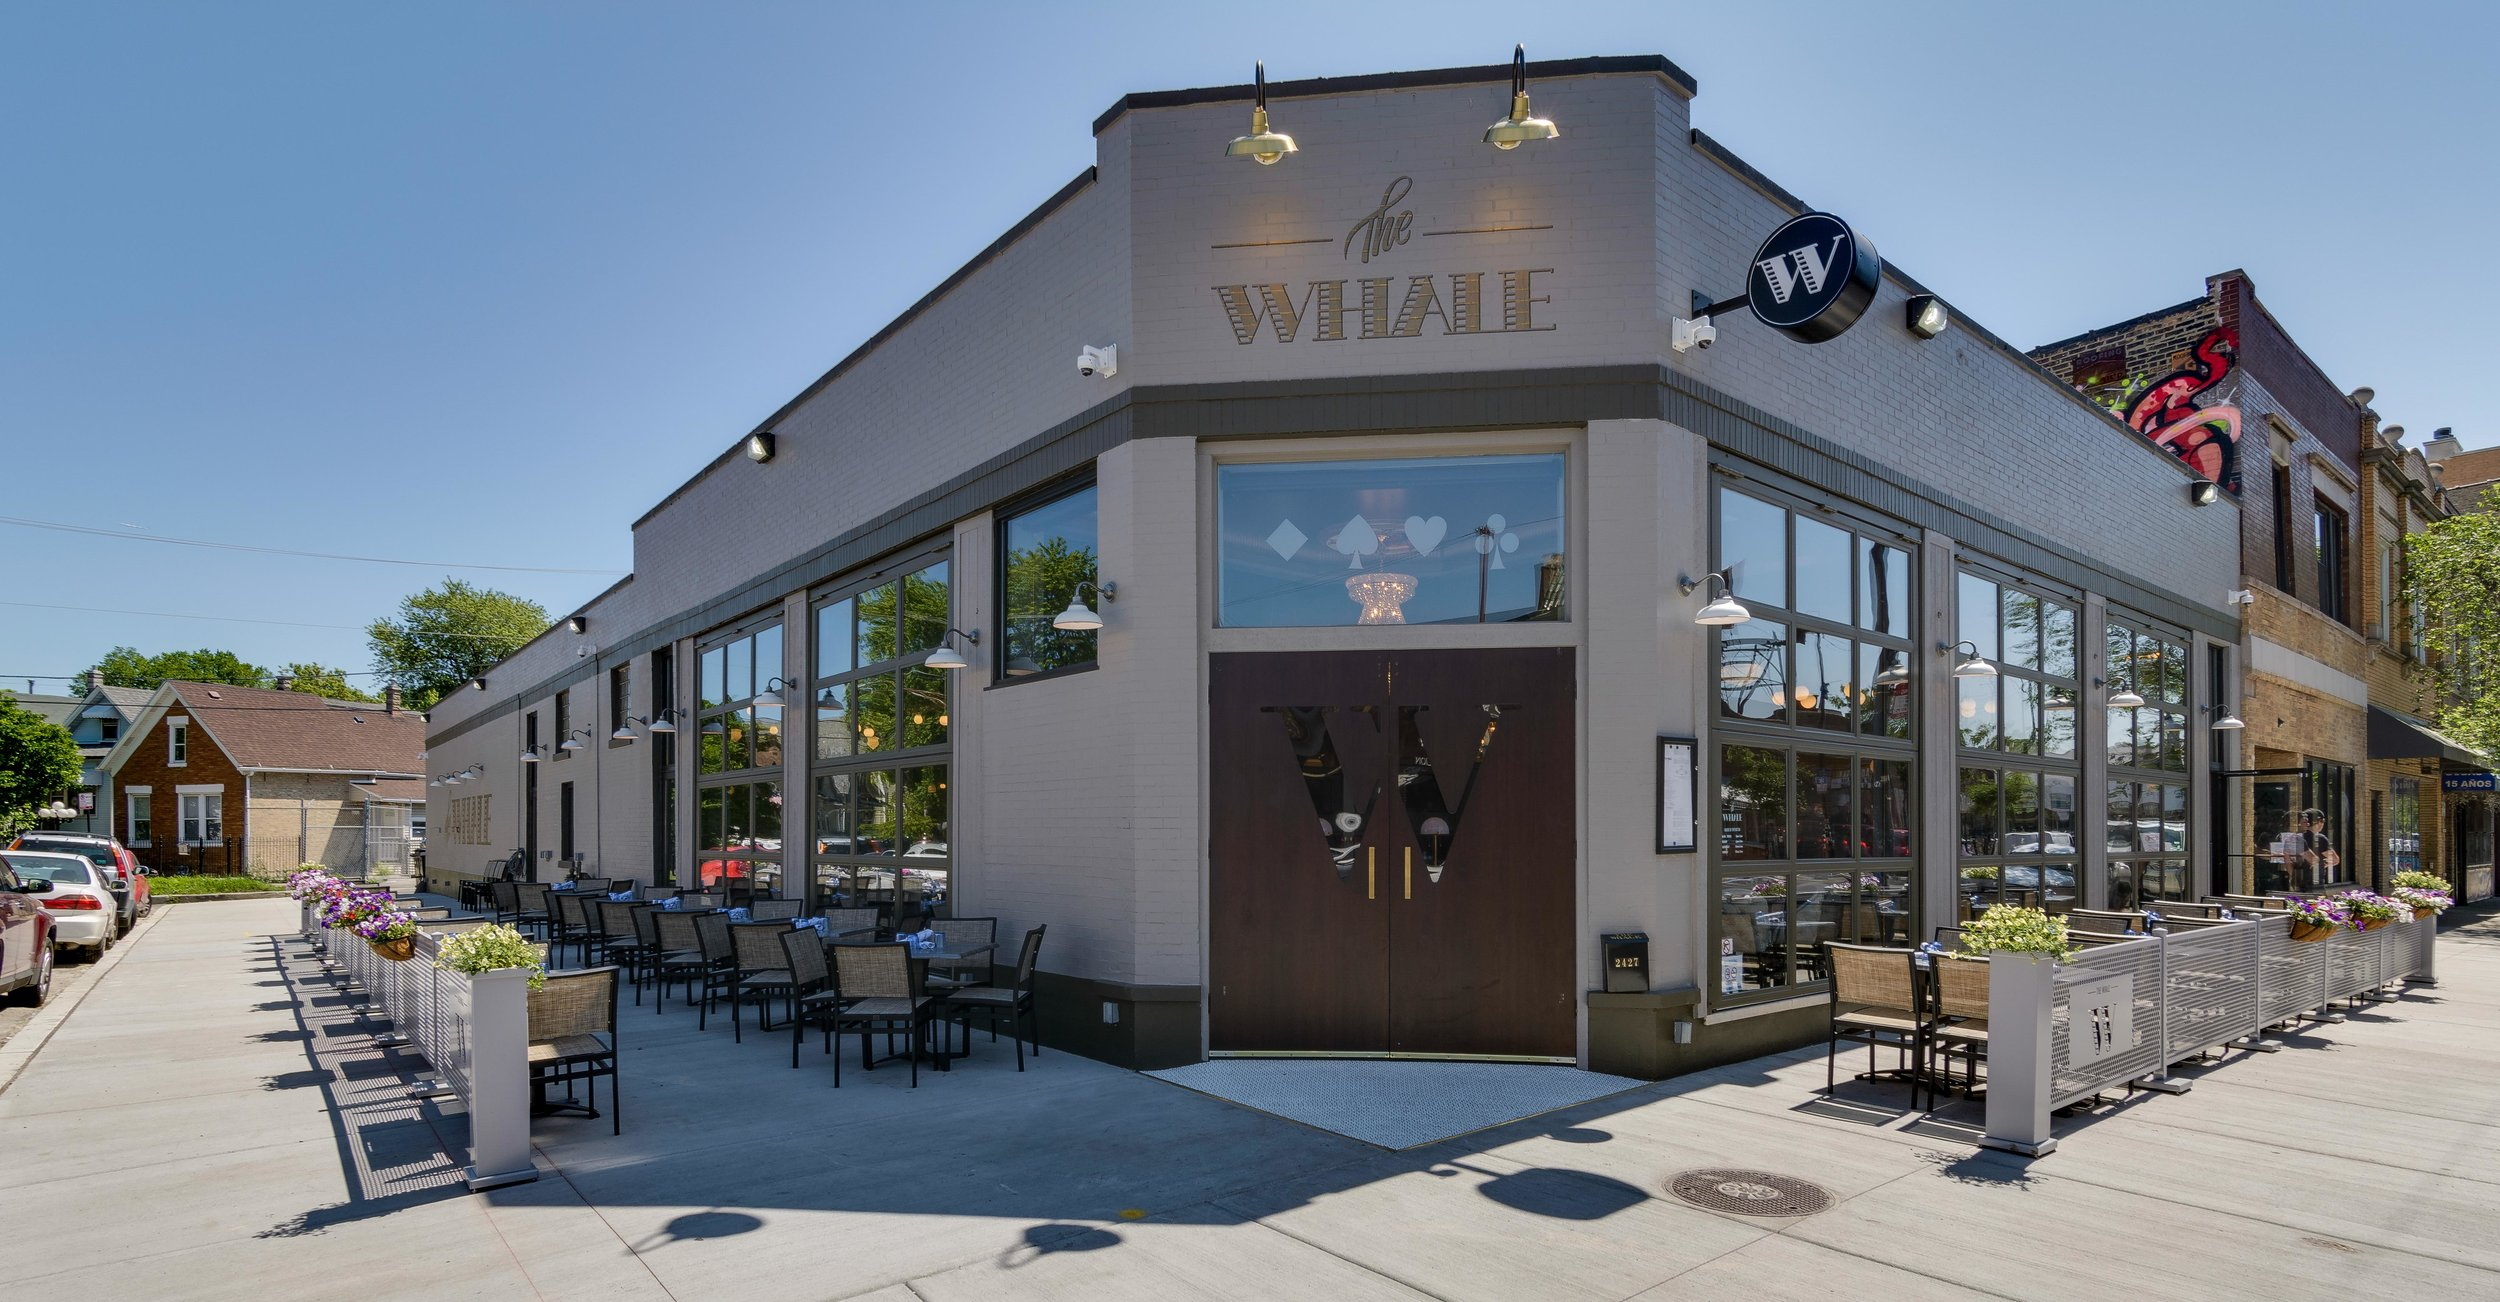 The Whale Restaurant - Web_015.jpg